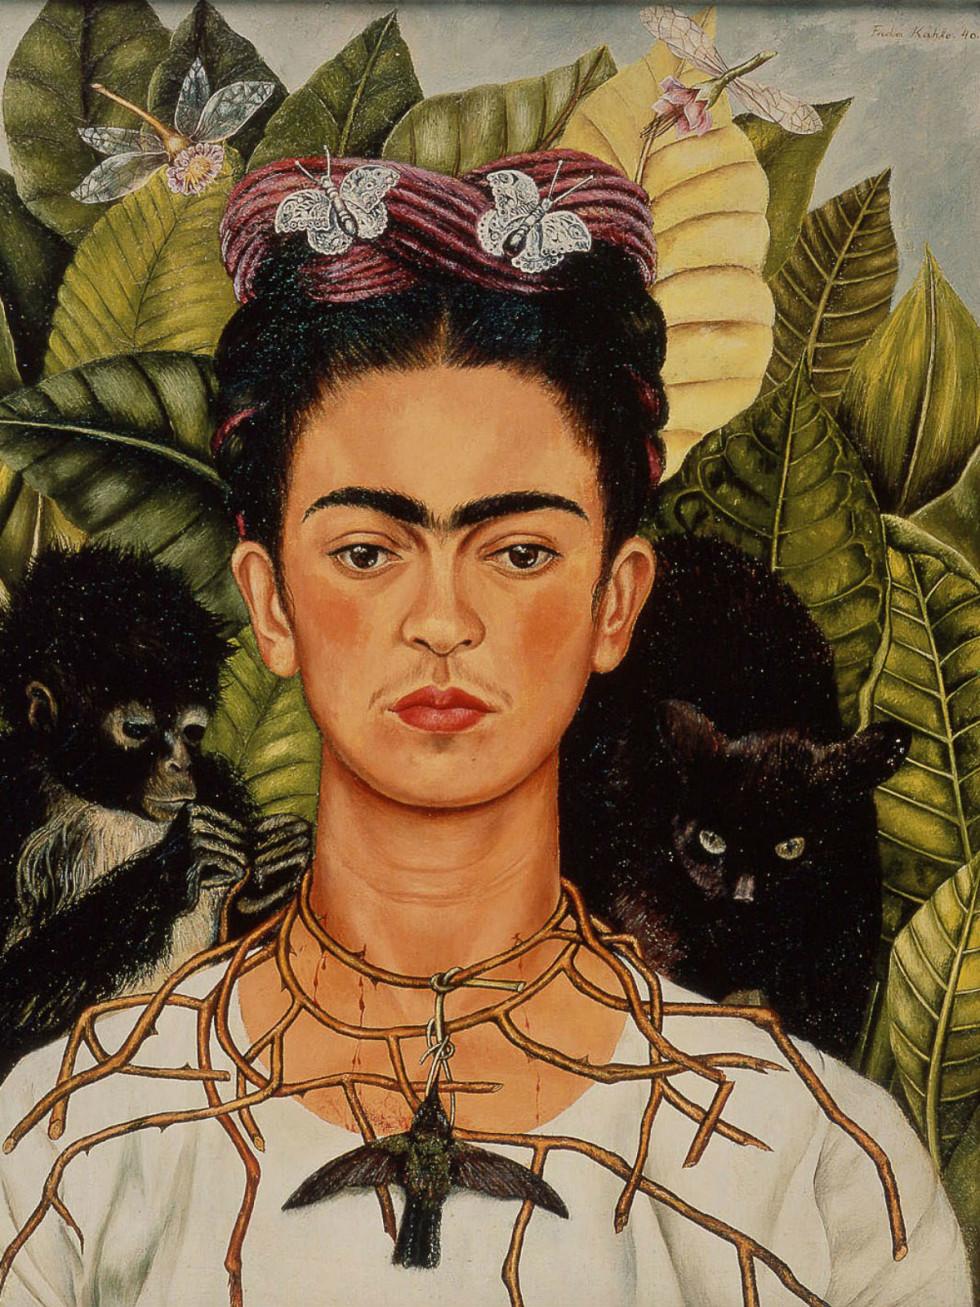 News_Frida_Kahlo_Self_Portrait_with_thorn necklace_hummingbirds